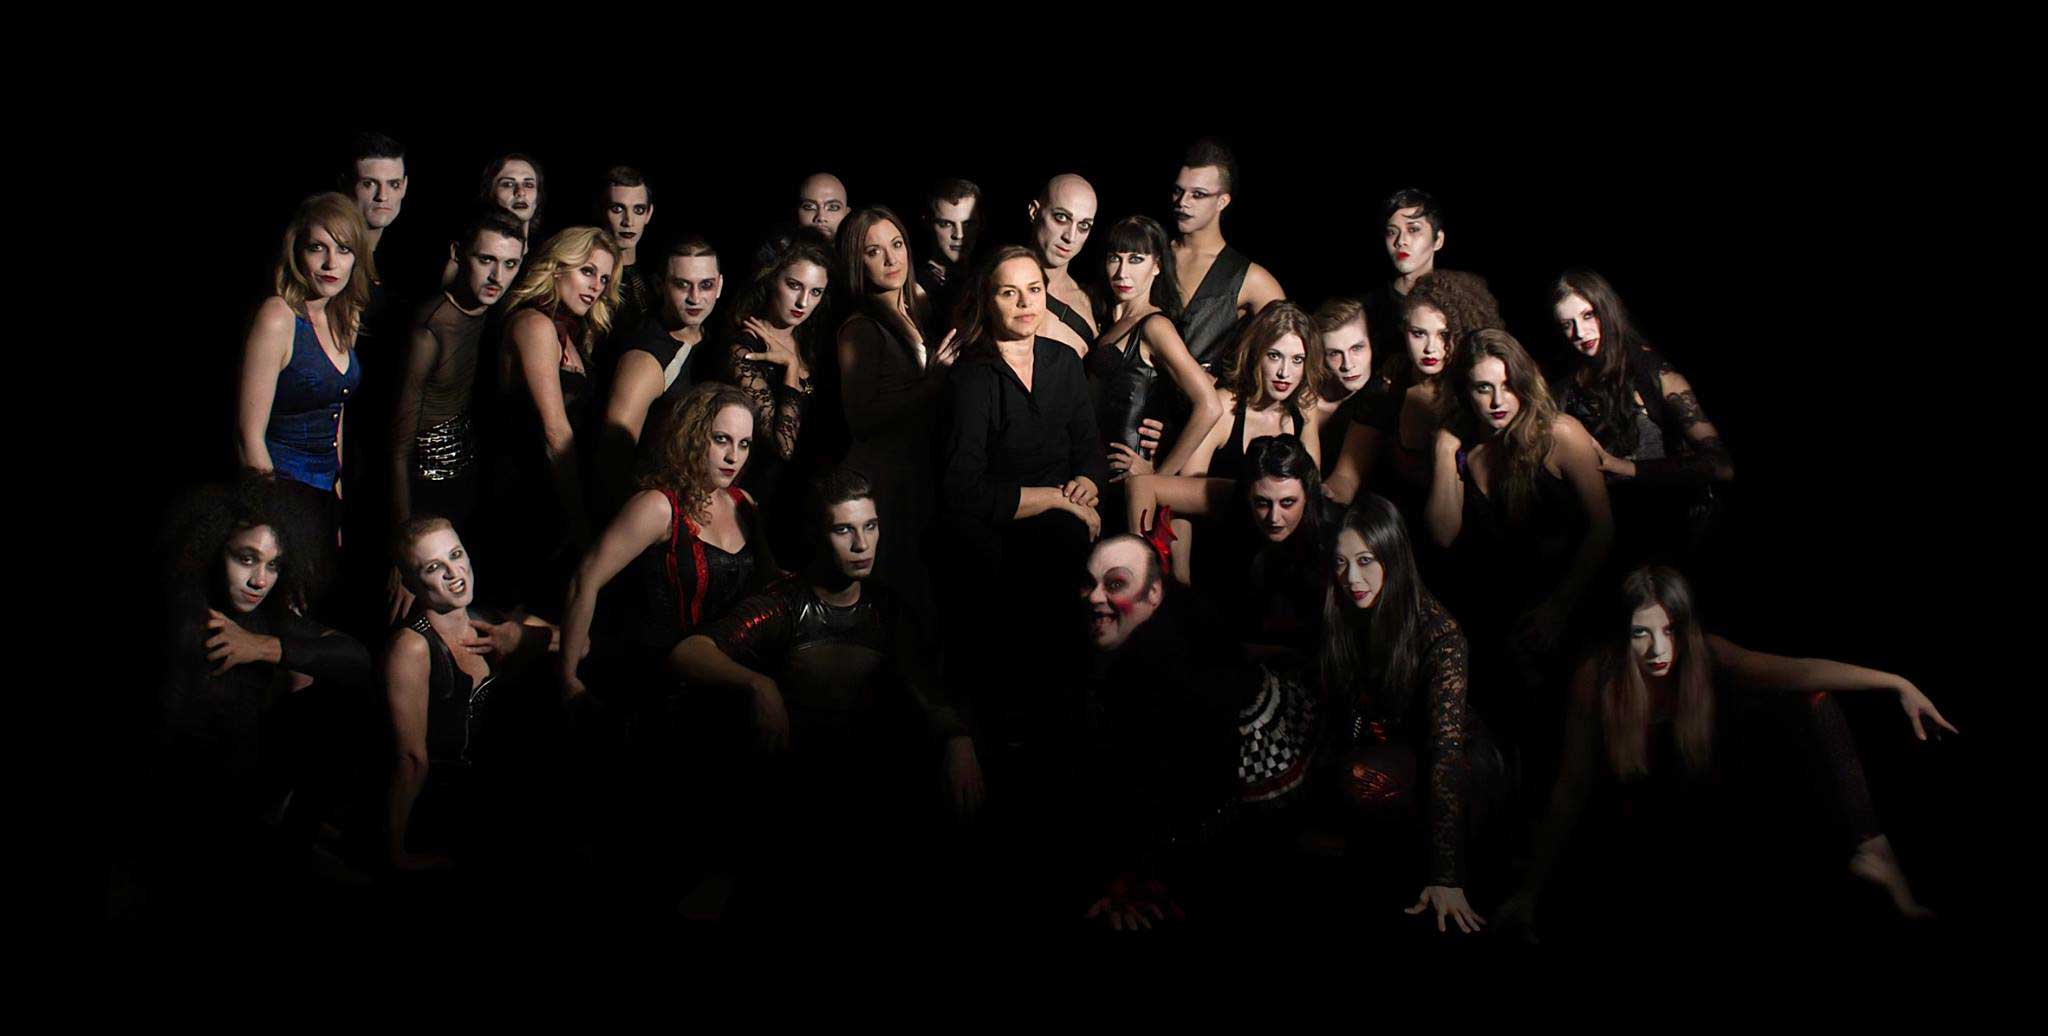 Vampire cast